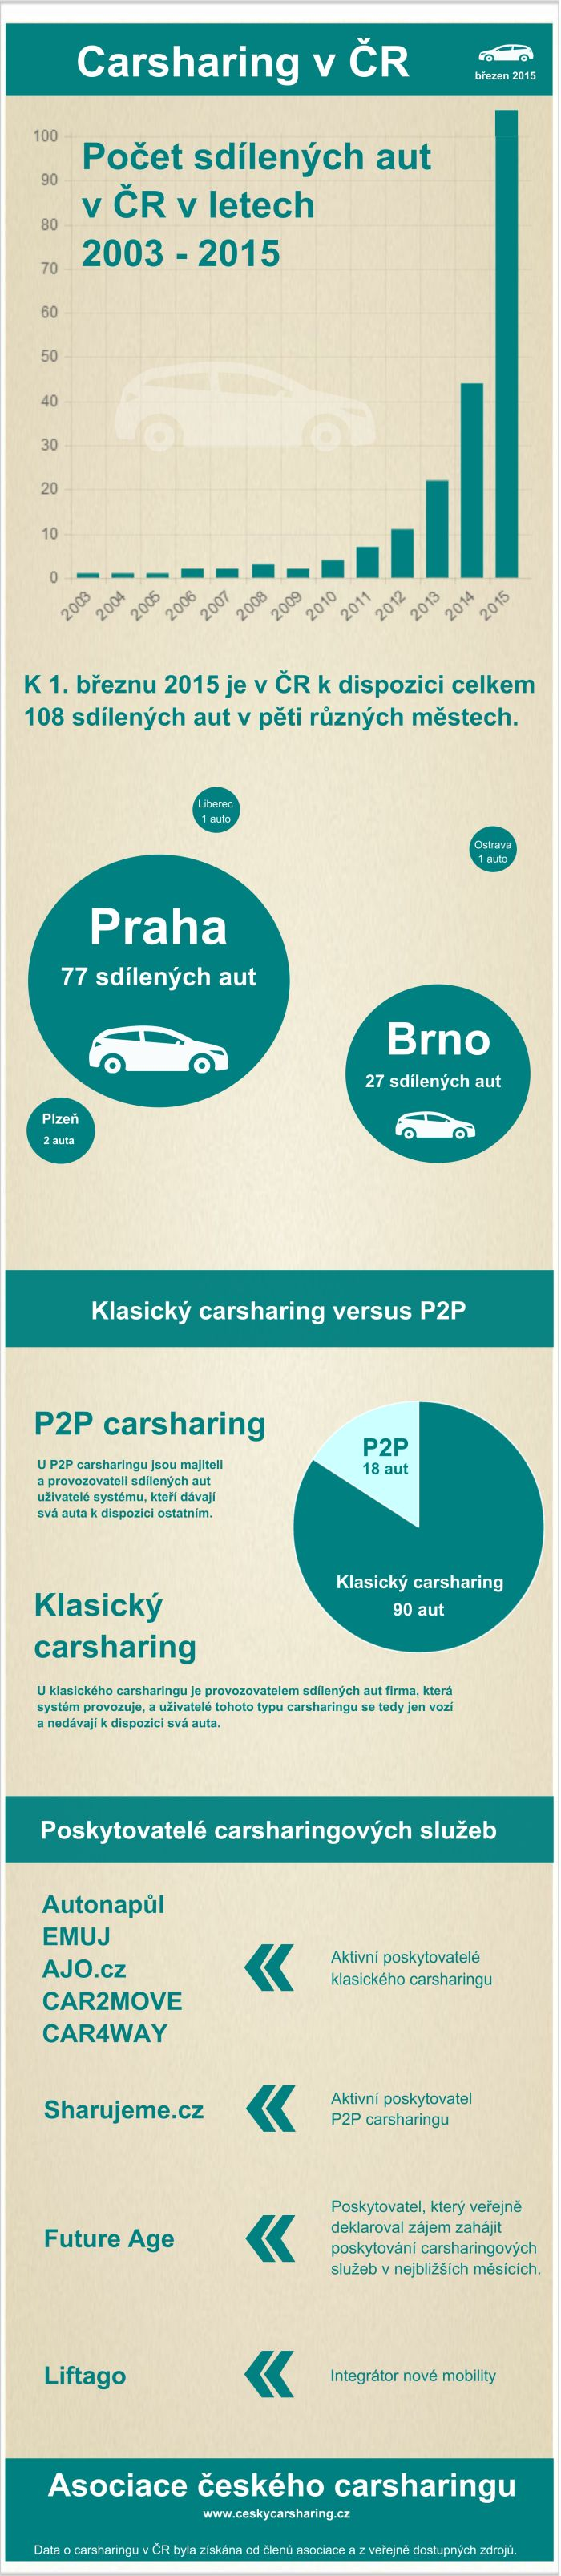 Carsharing v ČR infografika